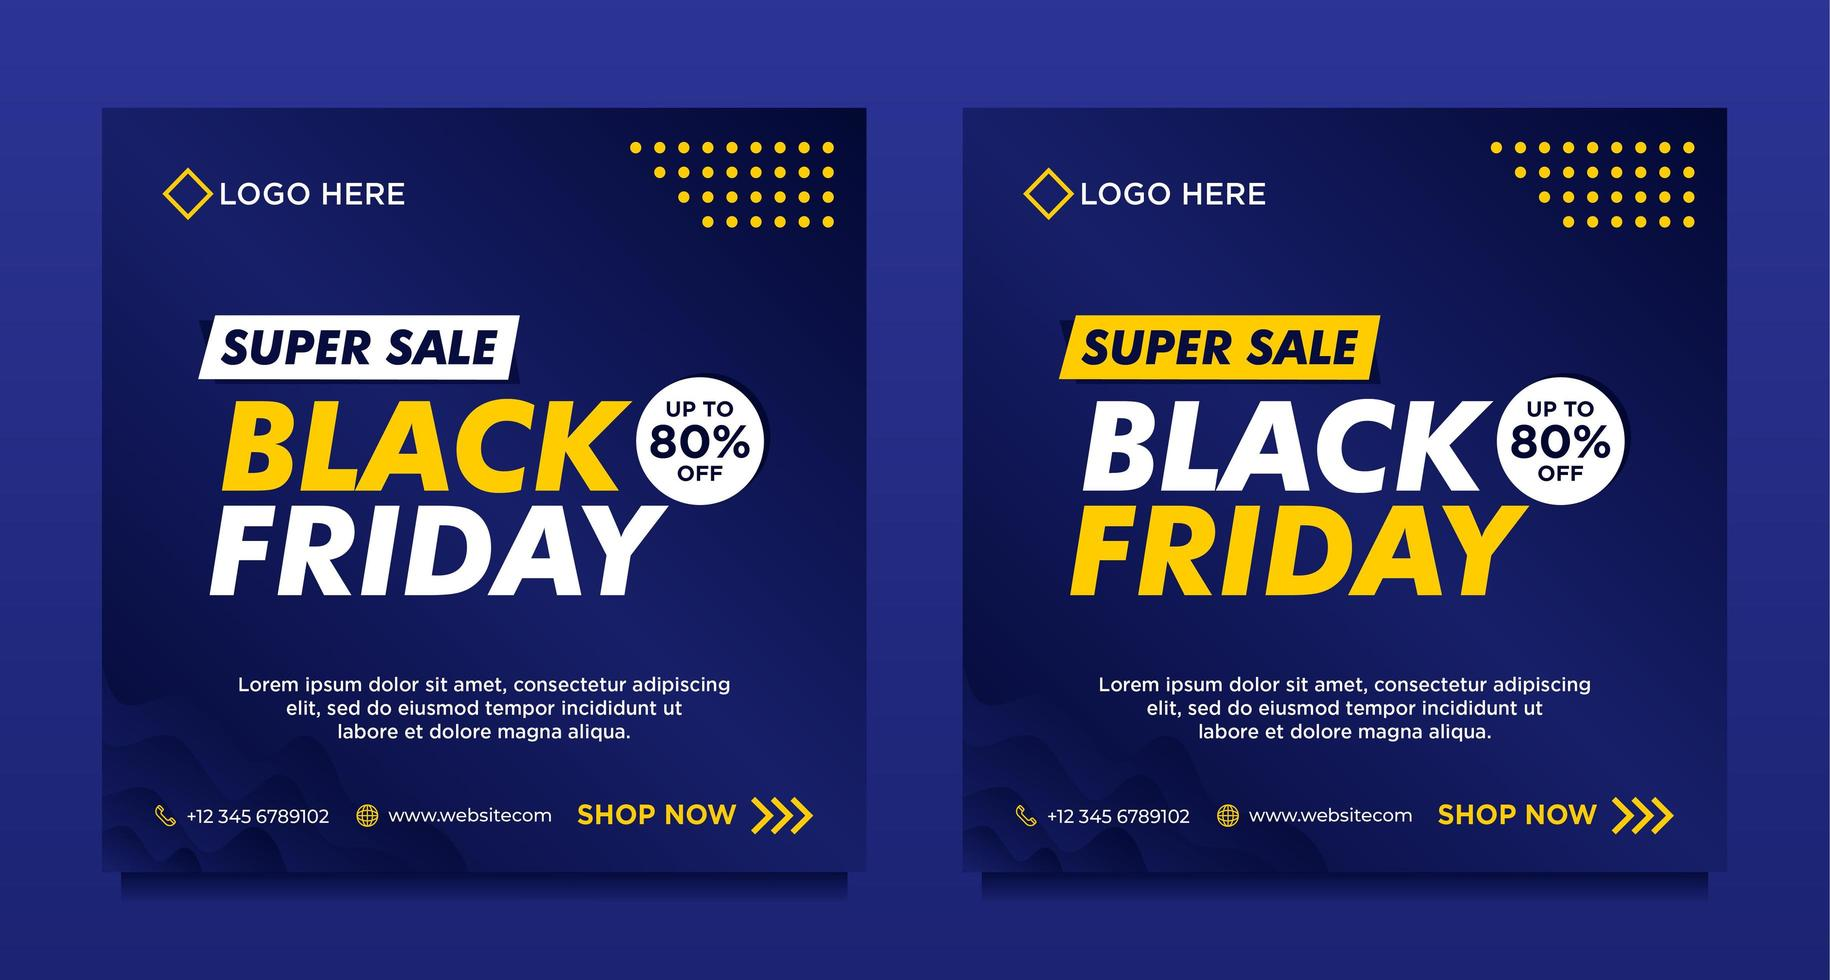 modelli di banner per social media in vendita venerdì nero blu vettore